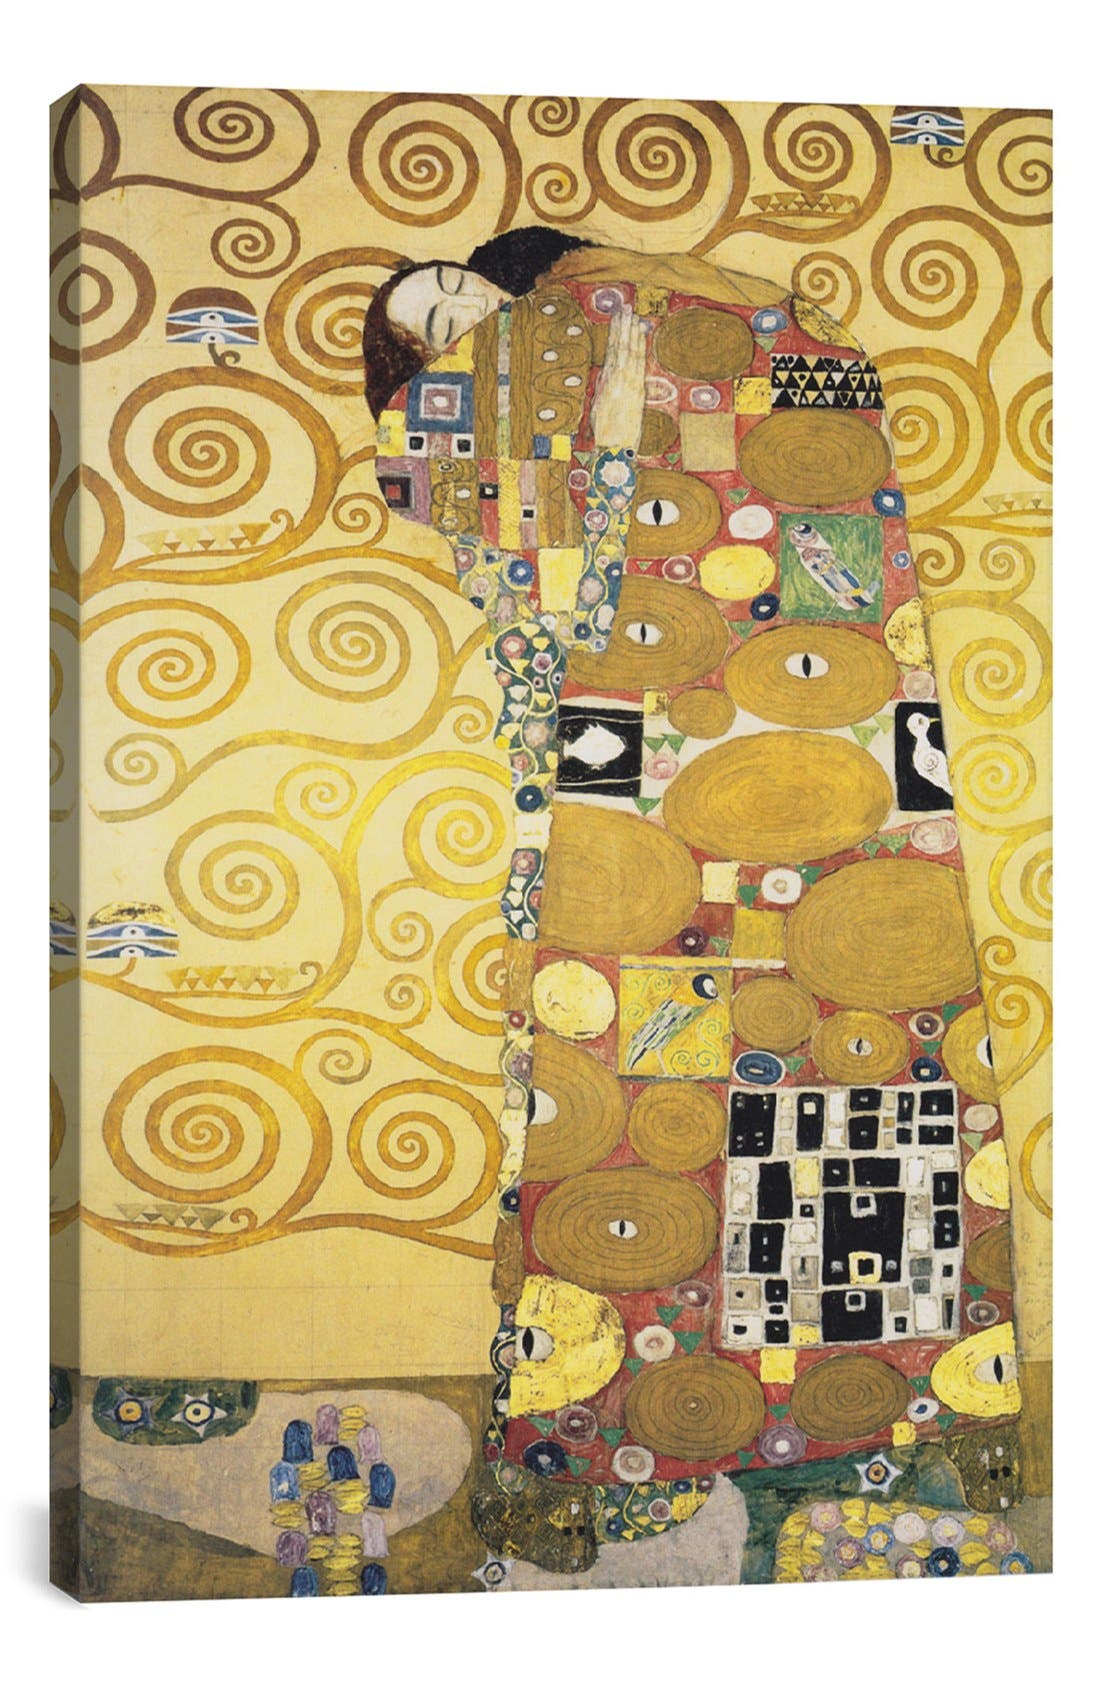 'Erfullung 1905 - Gustav Klimt' Giclée Print Canvas Art,                             Main thumbnail 1, color,                             700